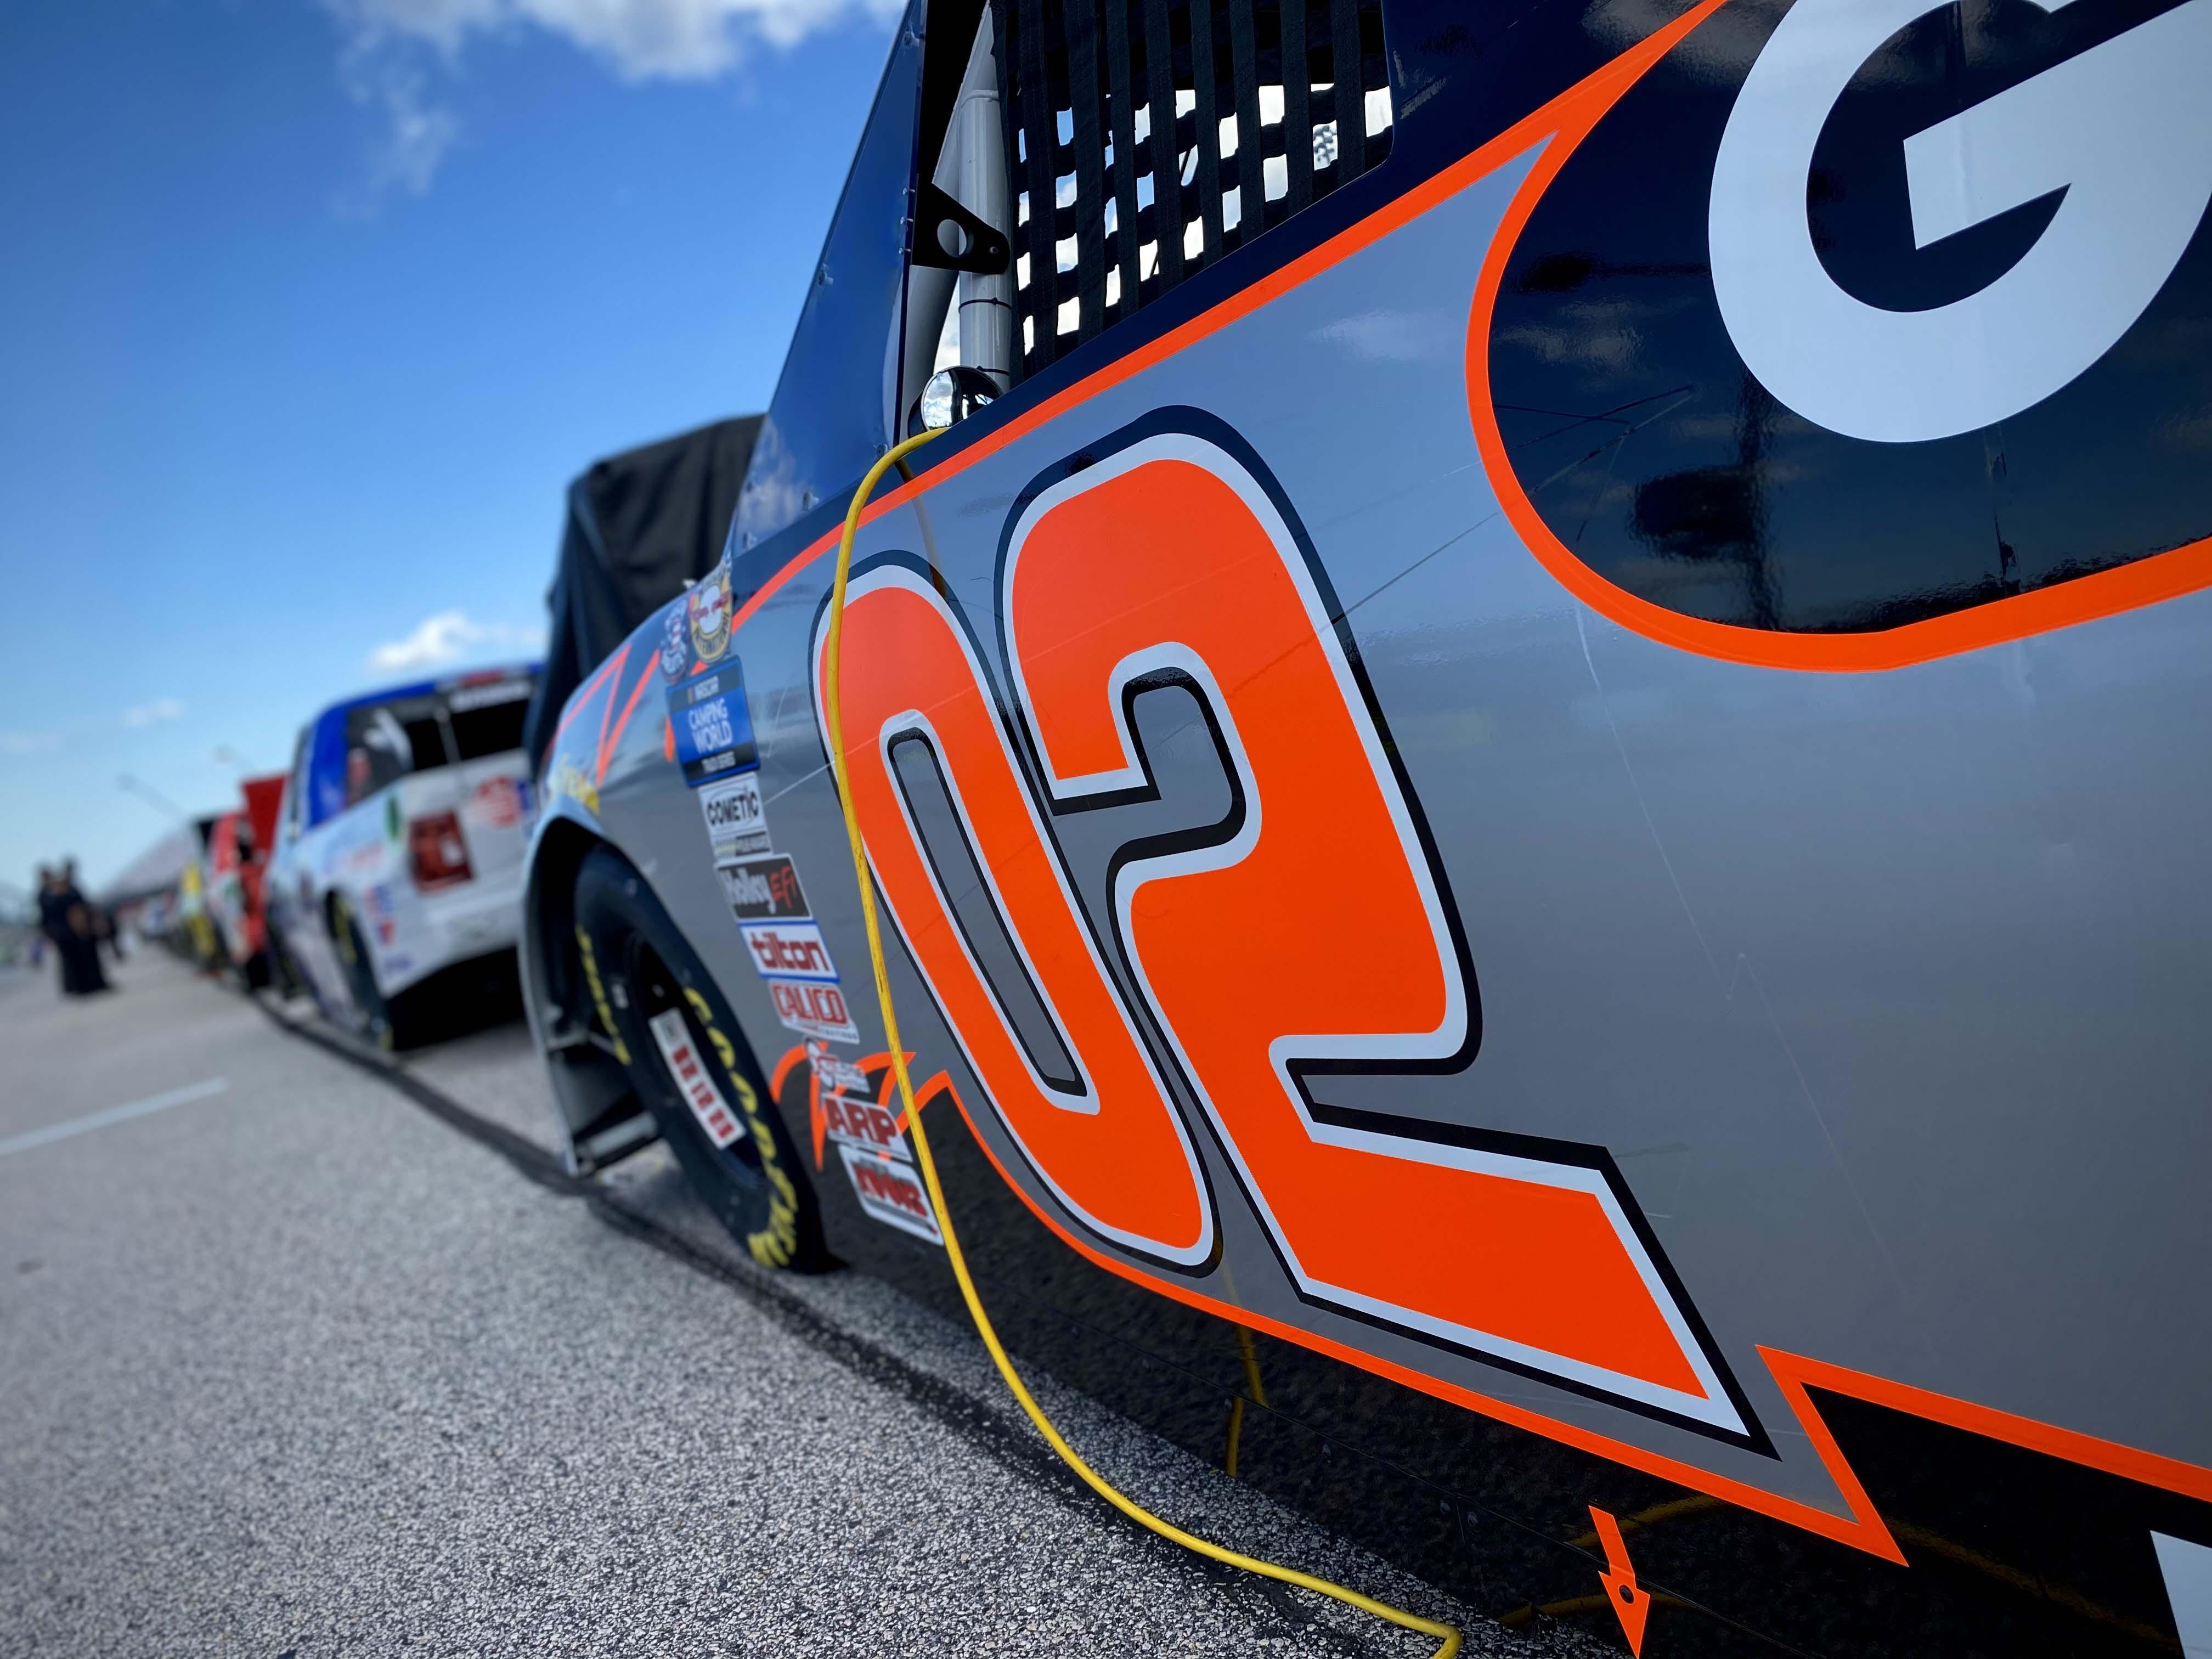 NASCAR Truck Series at Darlington Raceway - Dale Earnhardt Throwback